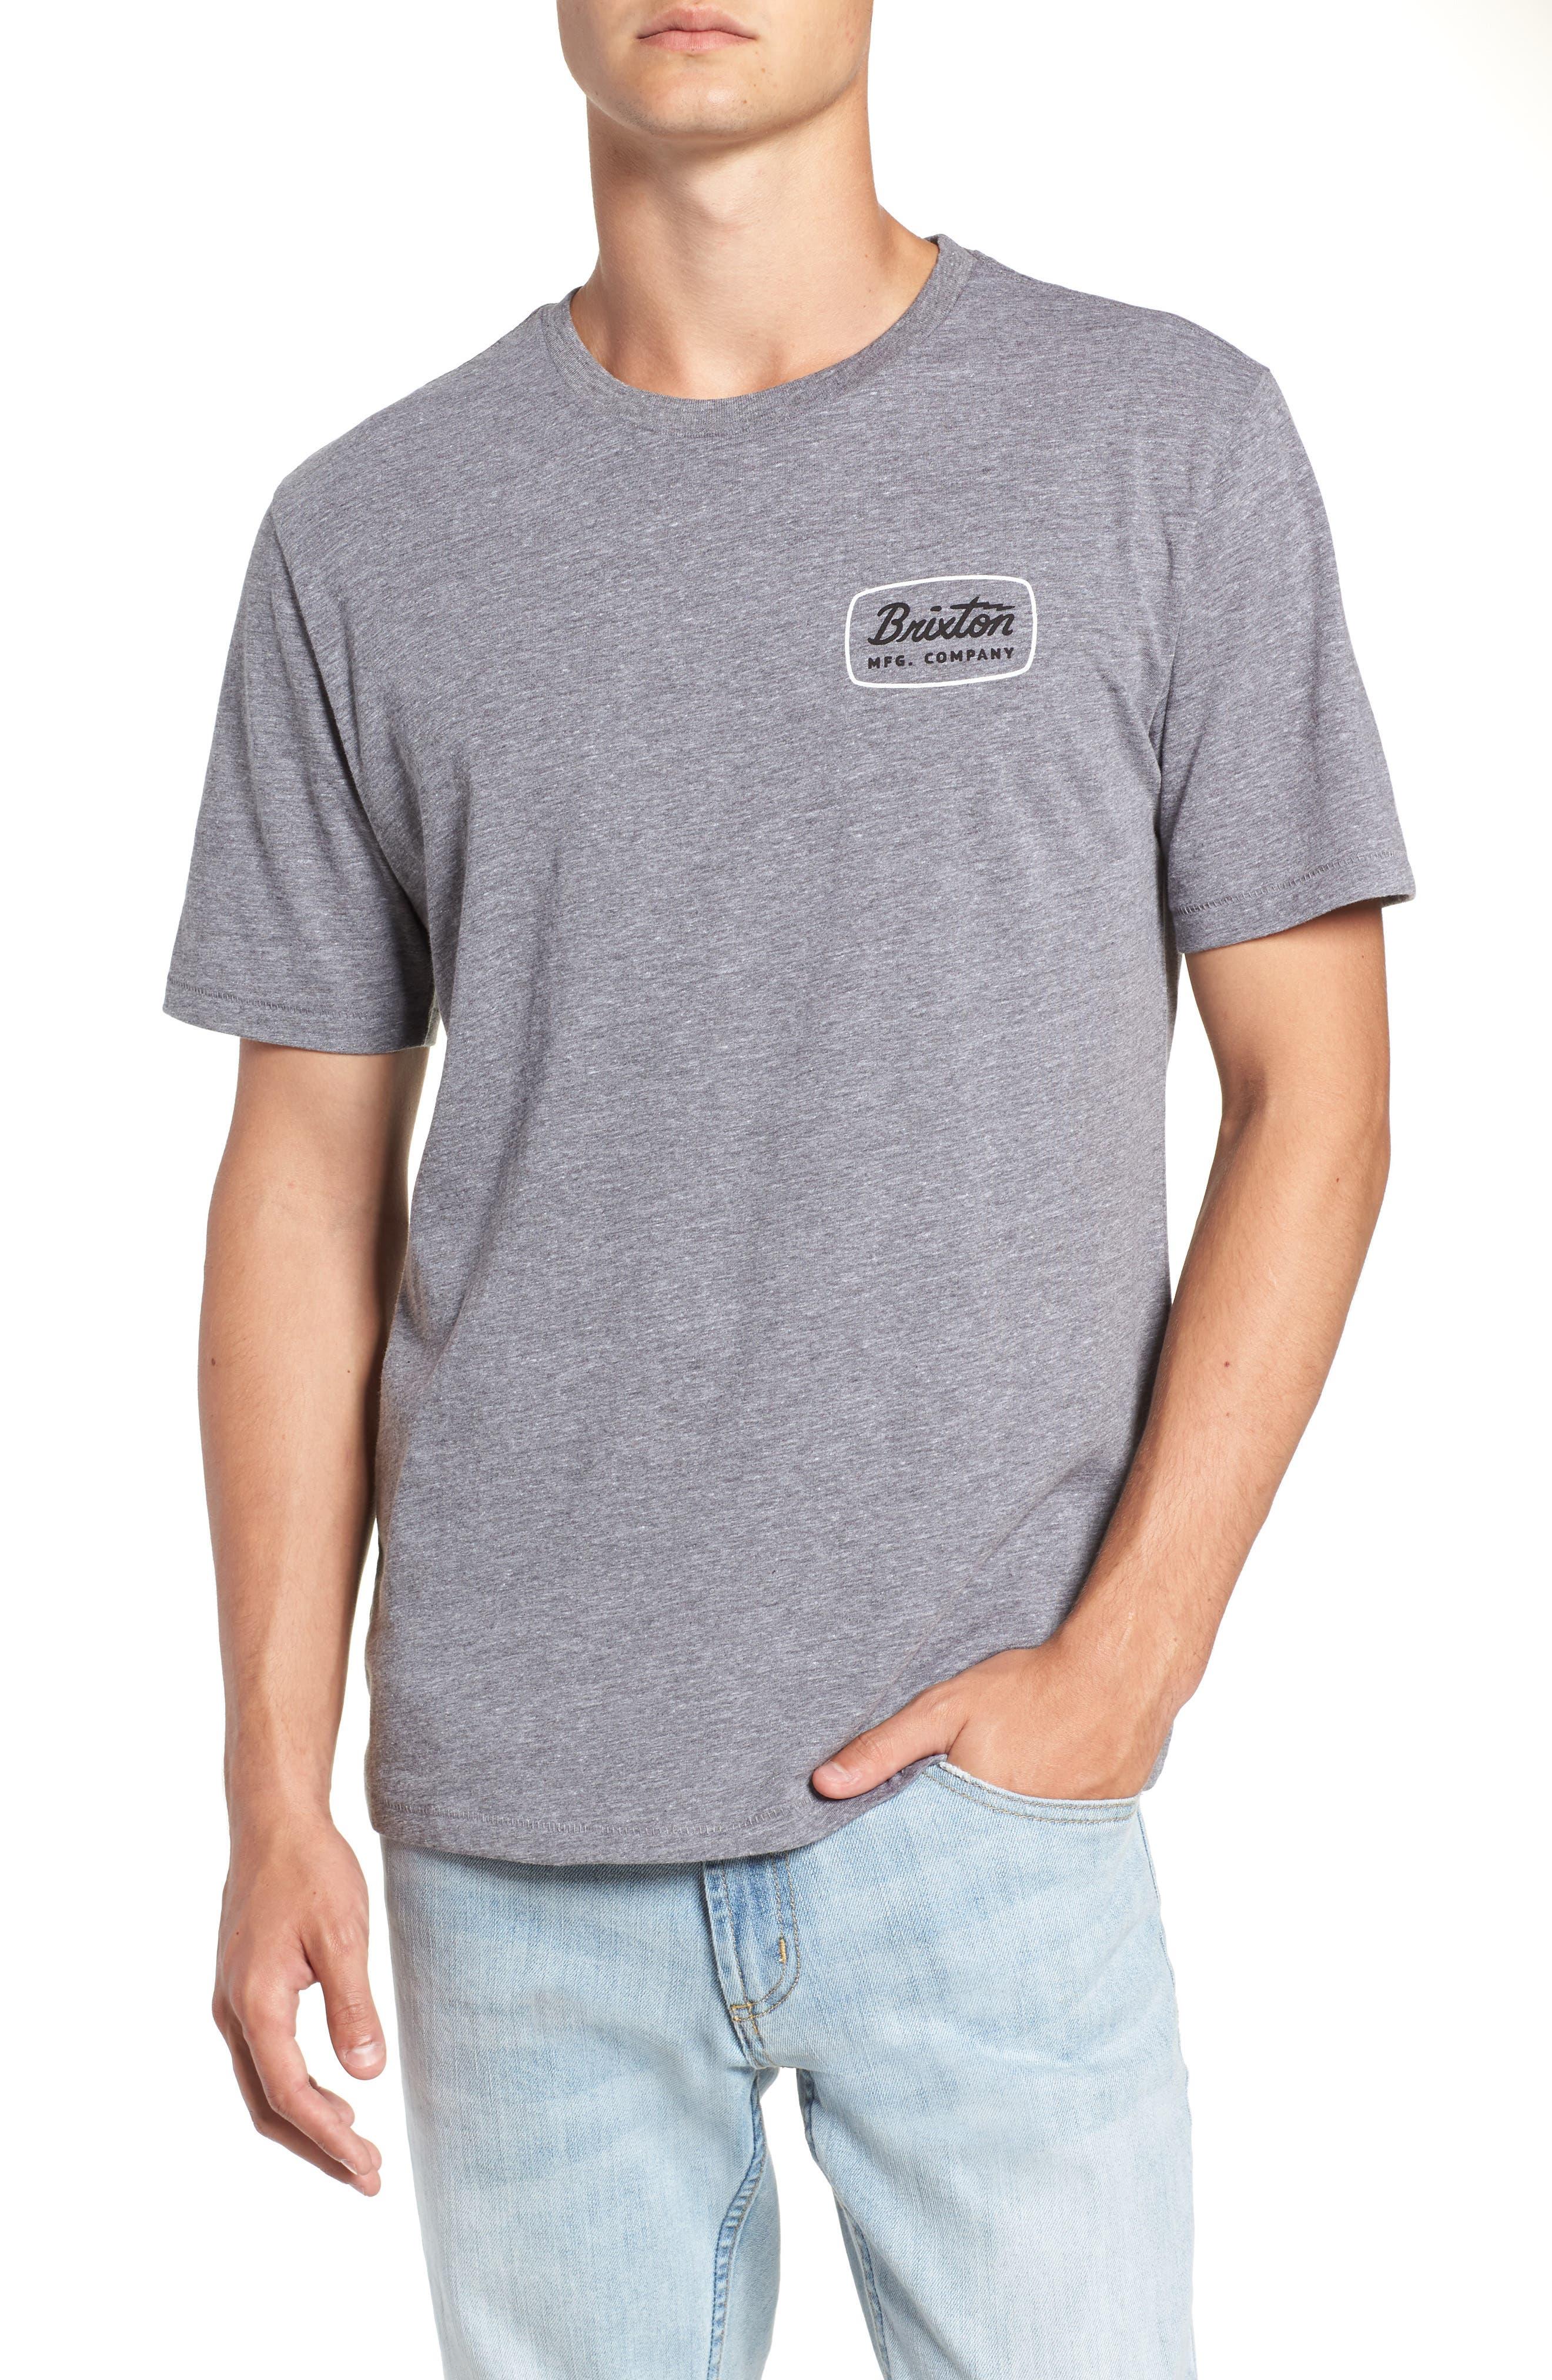 Jolt T-Shirt,                         Main,                         color, HEATHER GREY/ WHITE